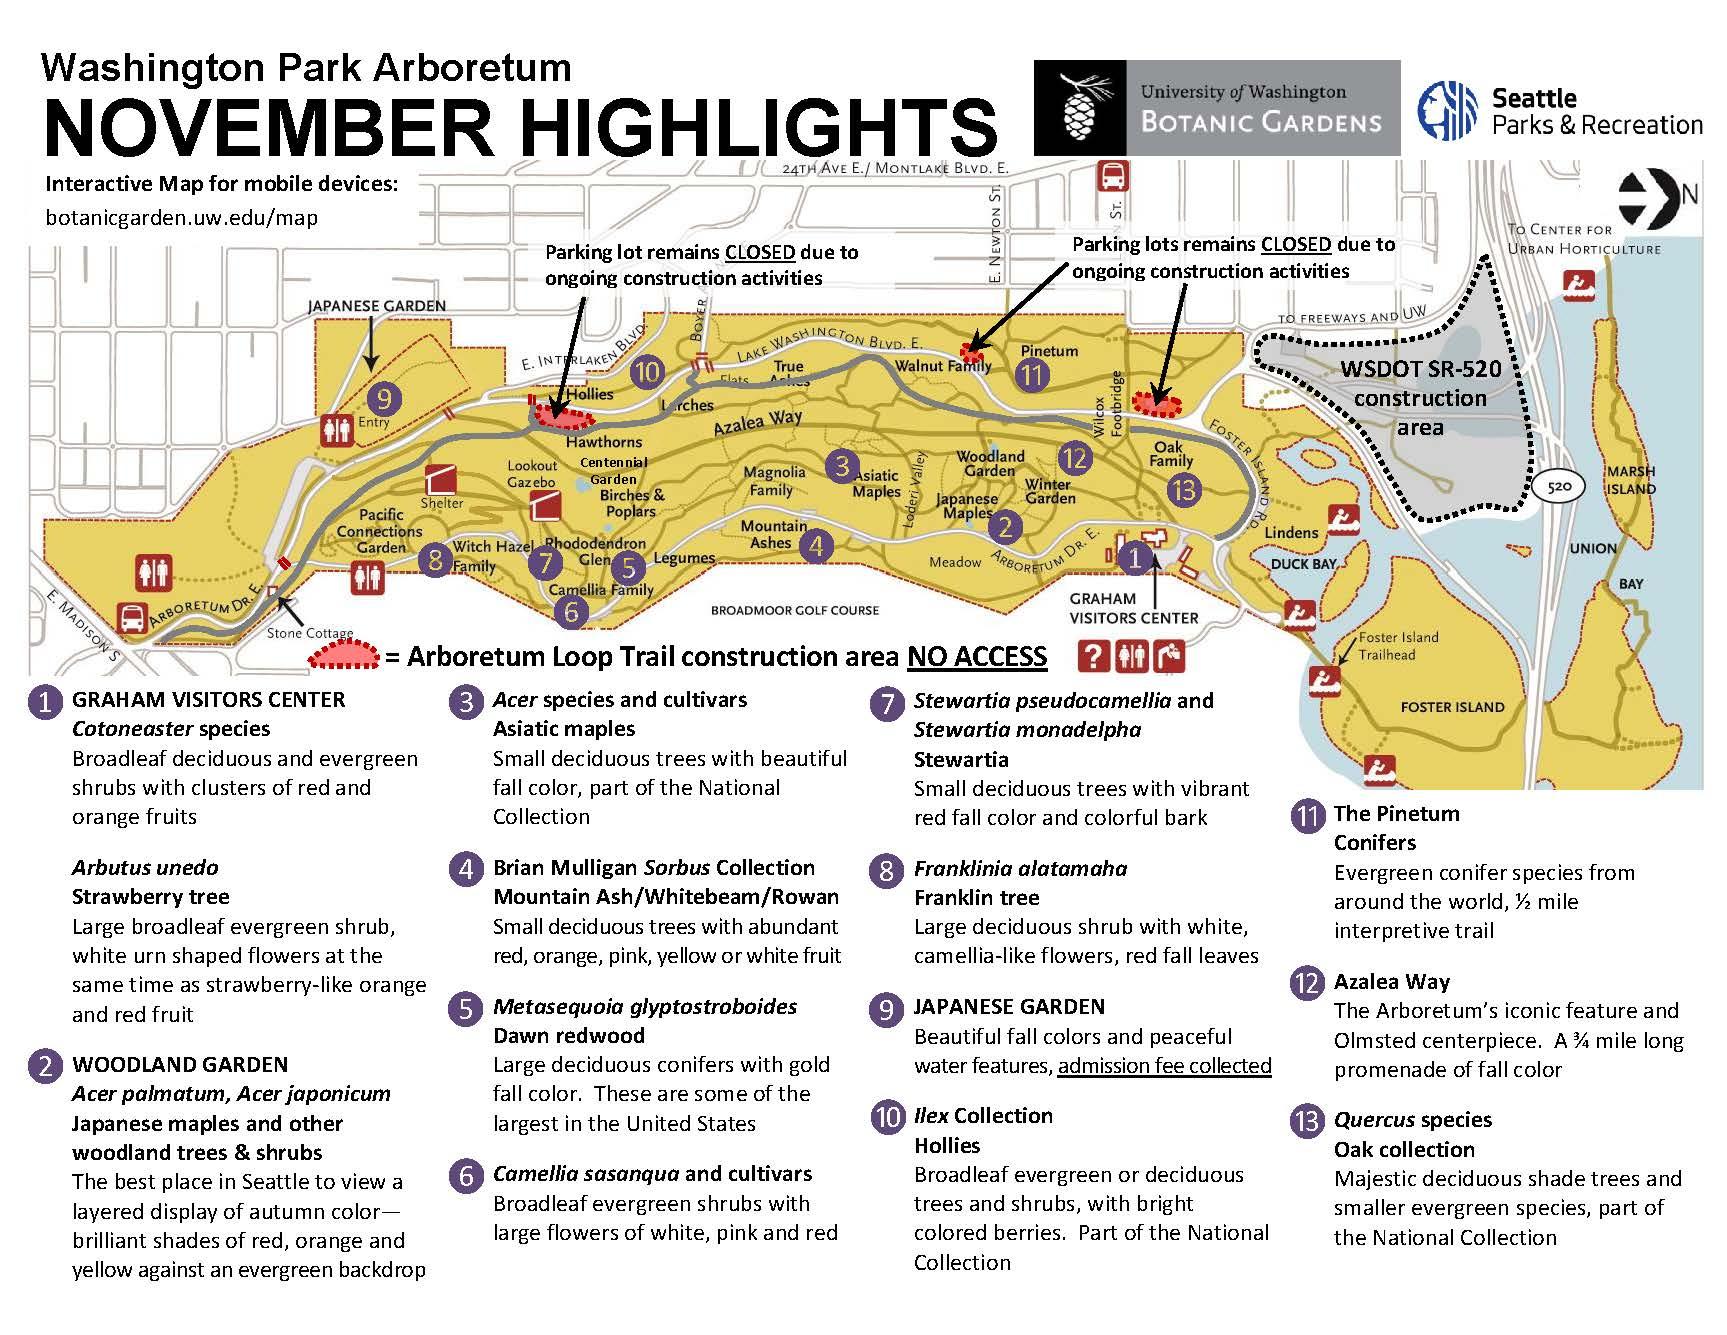 washington park arboretum loop trail open to public nov 10